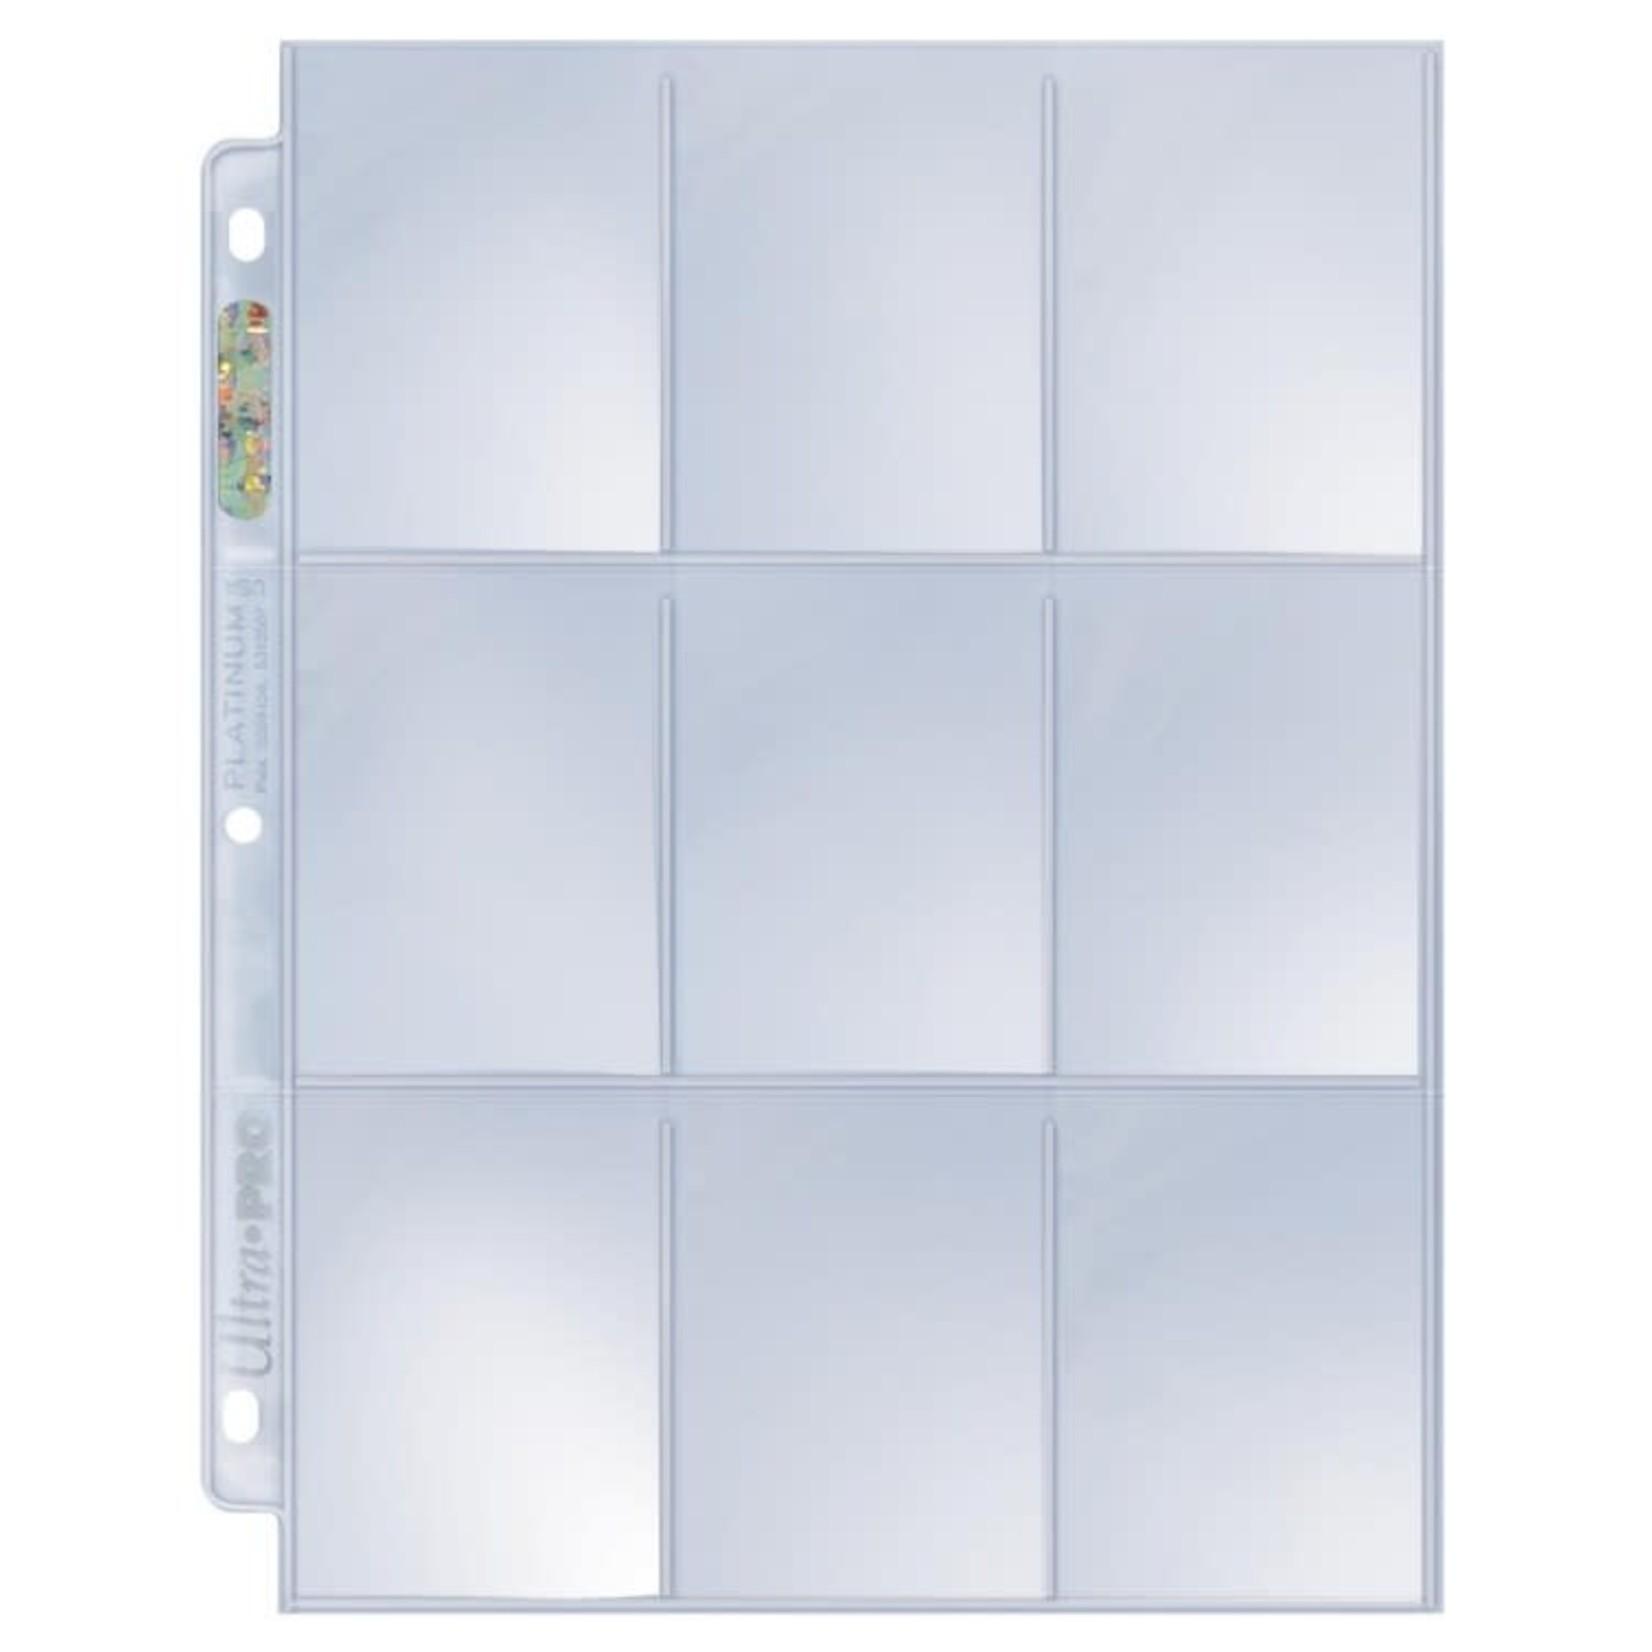 Ultra Pro Platinum Series: 9 Pocket Pages Box (100ct)